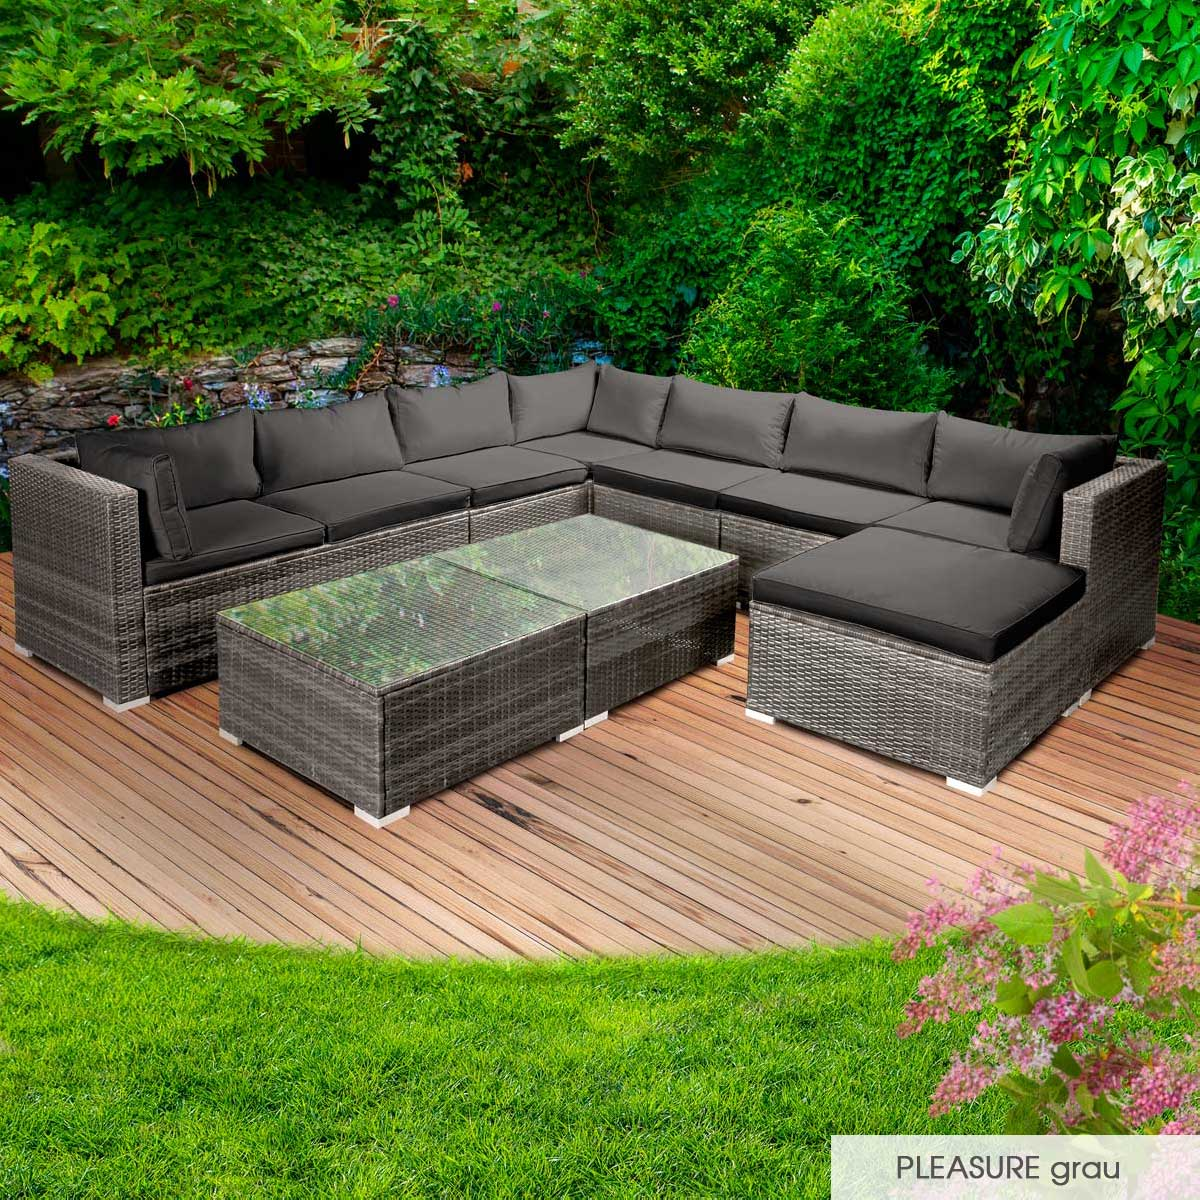 Gartenmoebel-Poly-Rattan-Lounge-Moebel-Sitzgarnitur-Gartengarnitur-Sitzgruppe-Sofa Indexbild 45